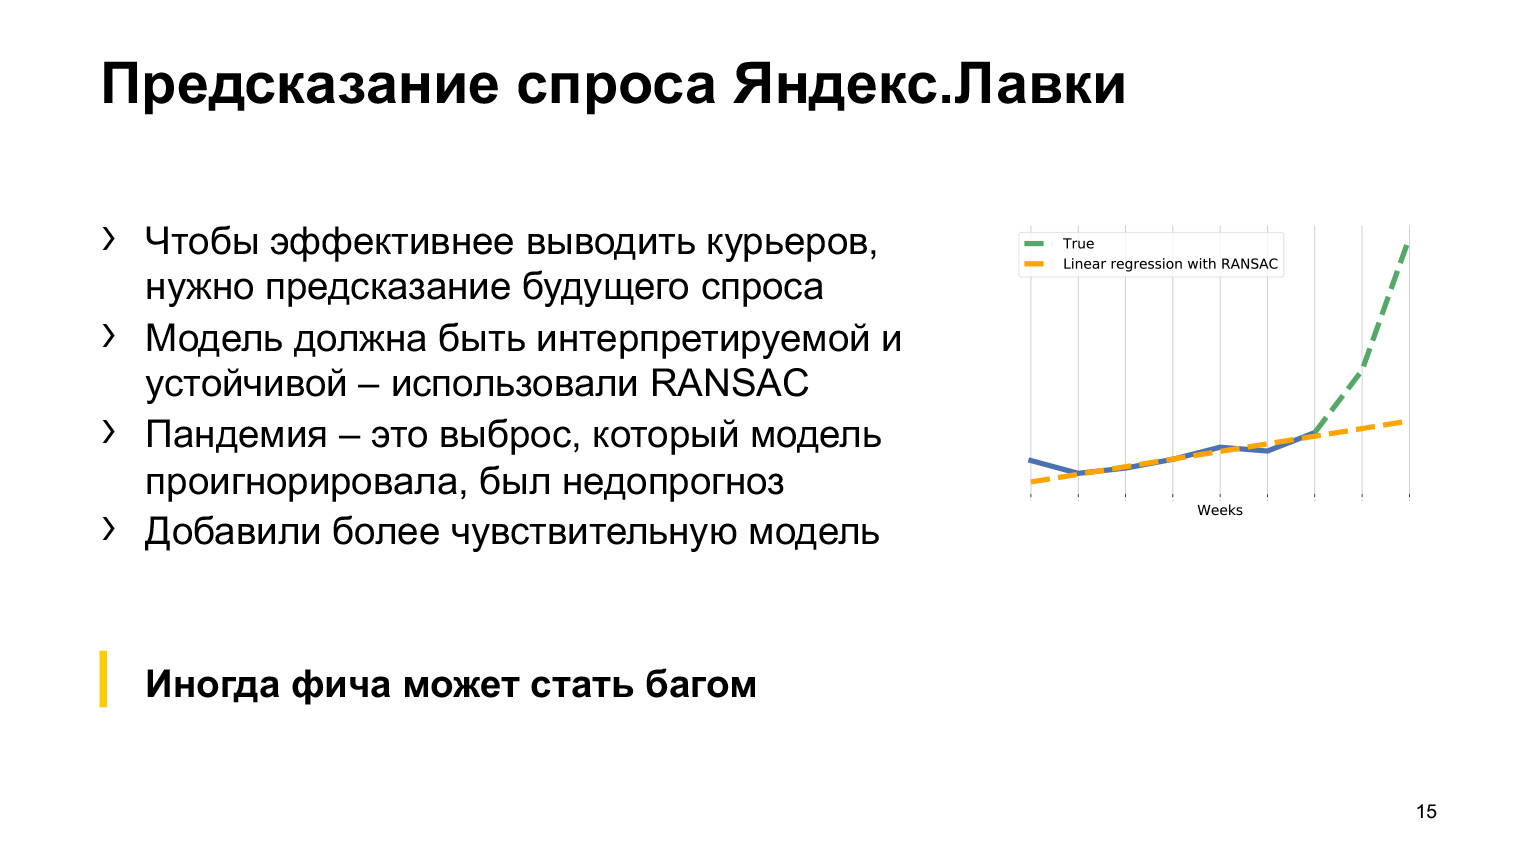 Как коронавирус повлиял на ML-проекты Такси, Еды и Лавки. Доклад Яндекса - 7